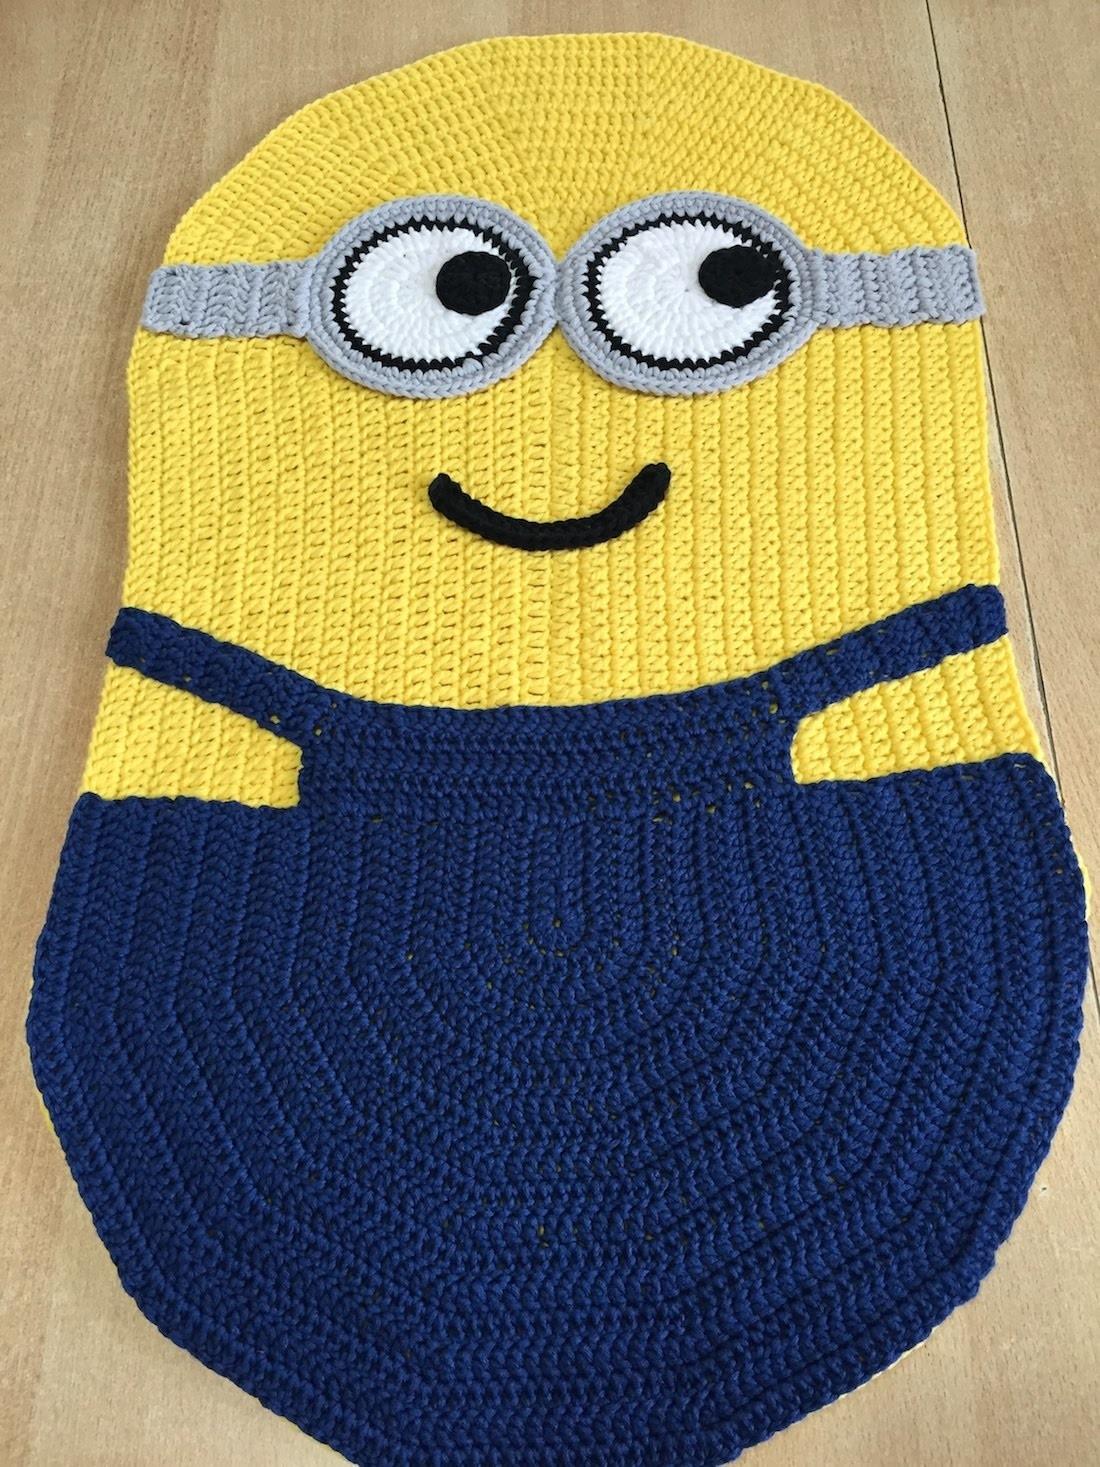 Carrelage Design tapis crochet Tuto Facile Tapis, coussin Minions au crochet, My Crafts and DIY ...